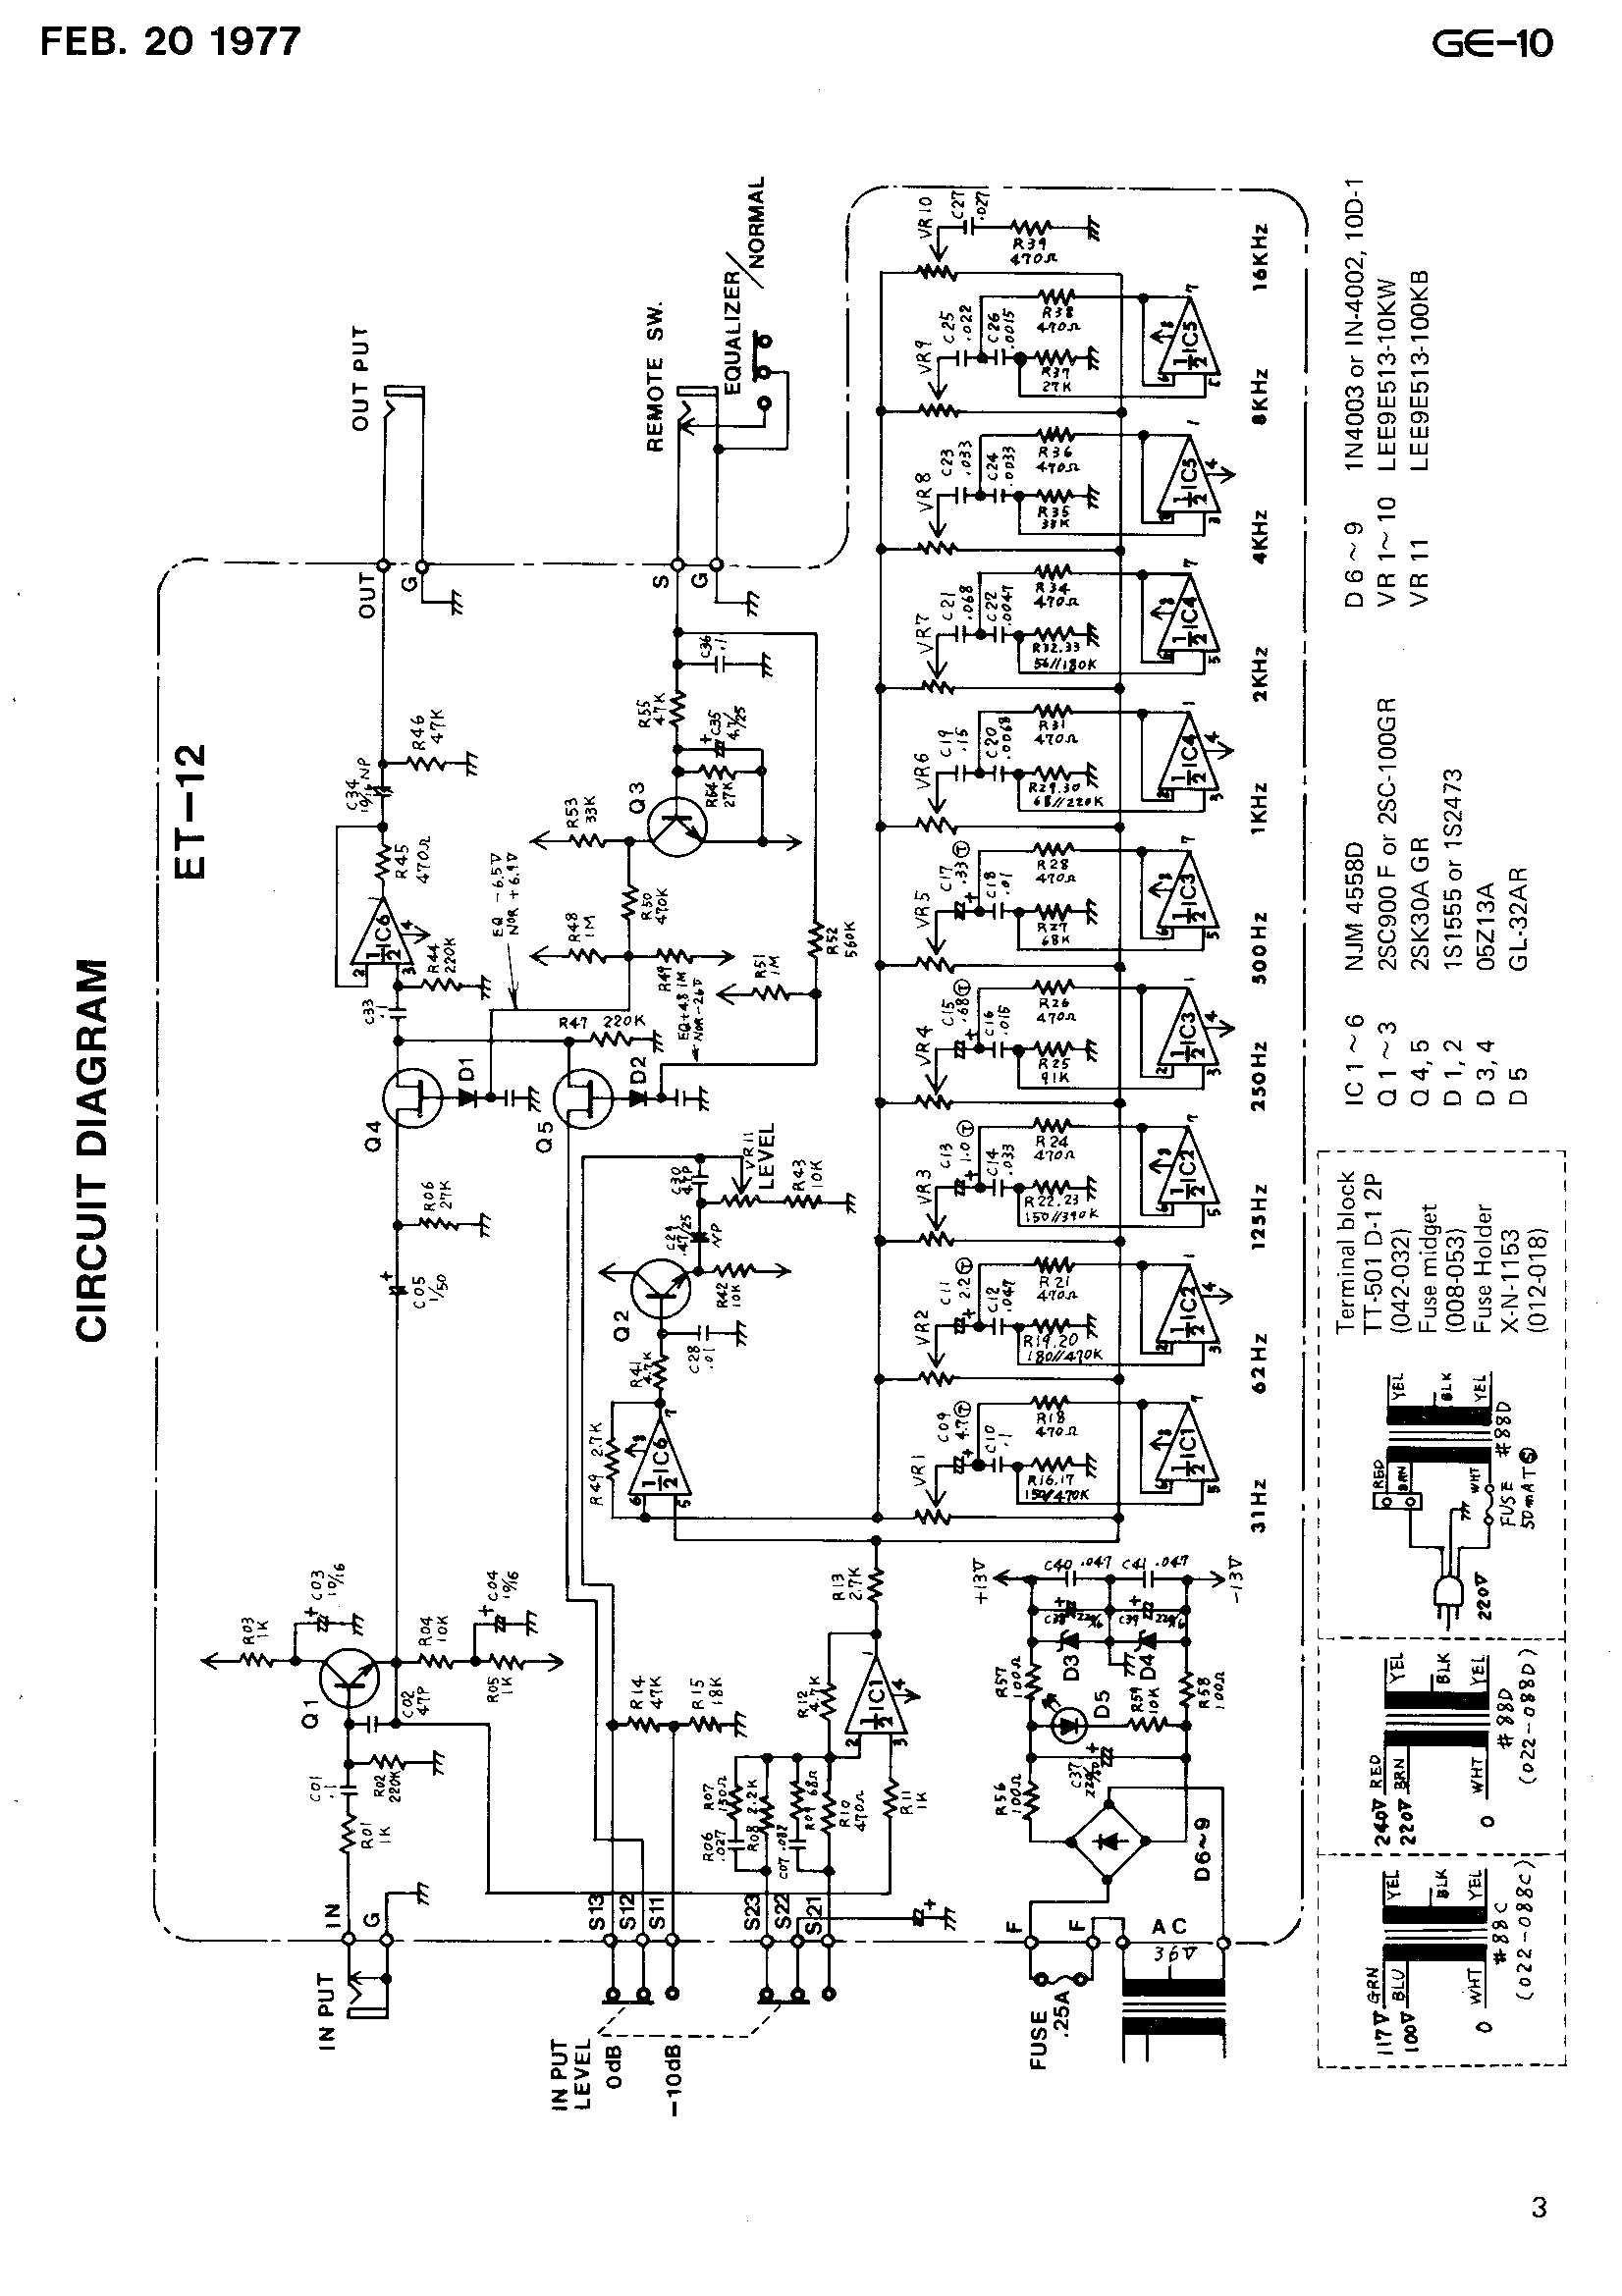 small resolution of note 3 circuit diagram wiring diagram mega galaxy note 3 block diagram